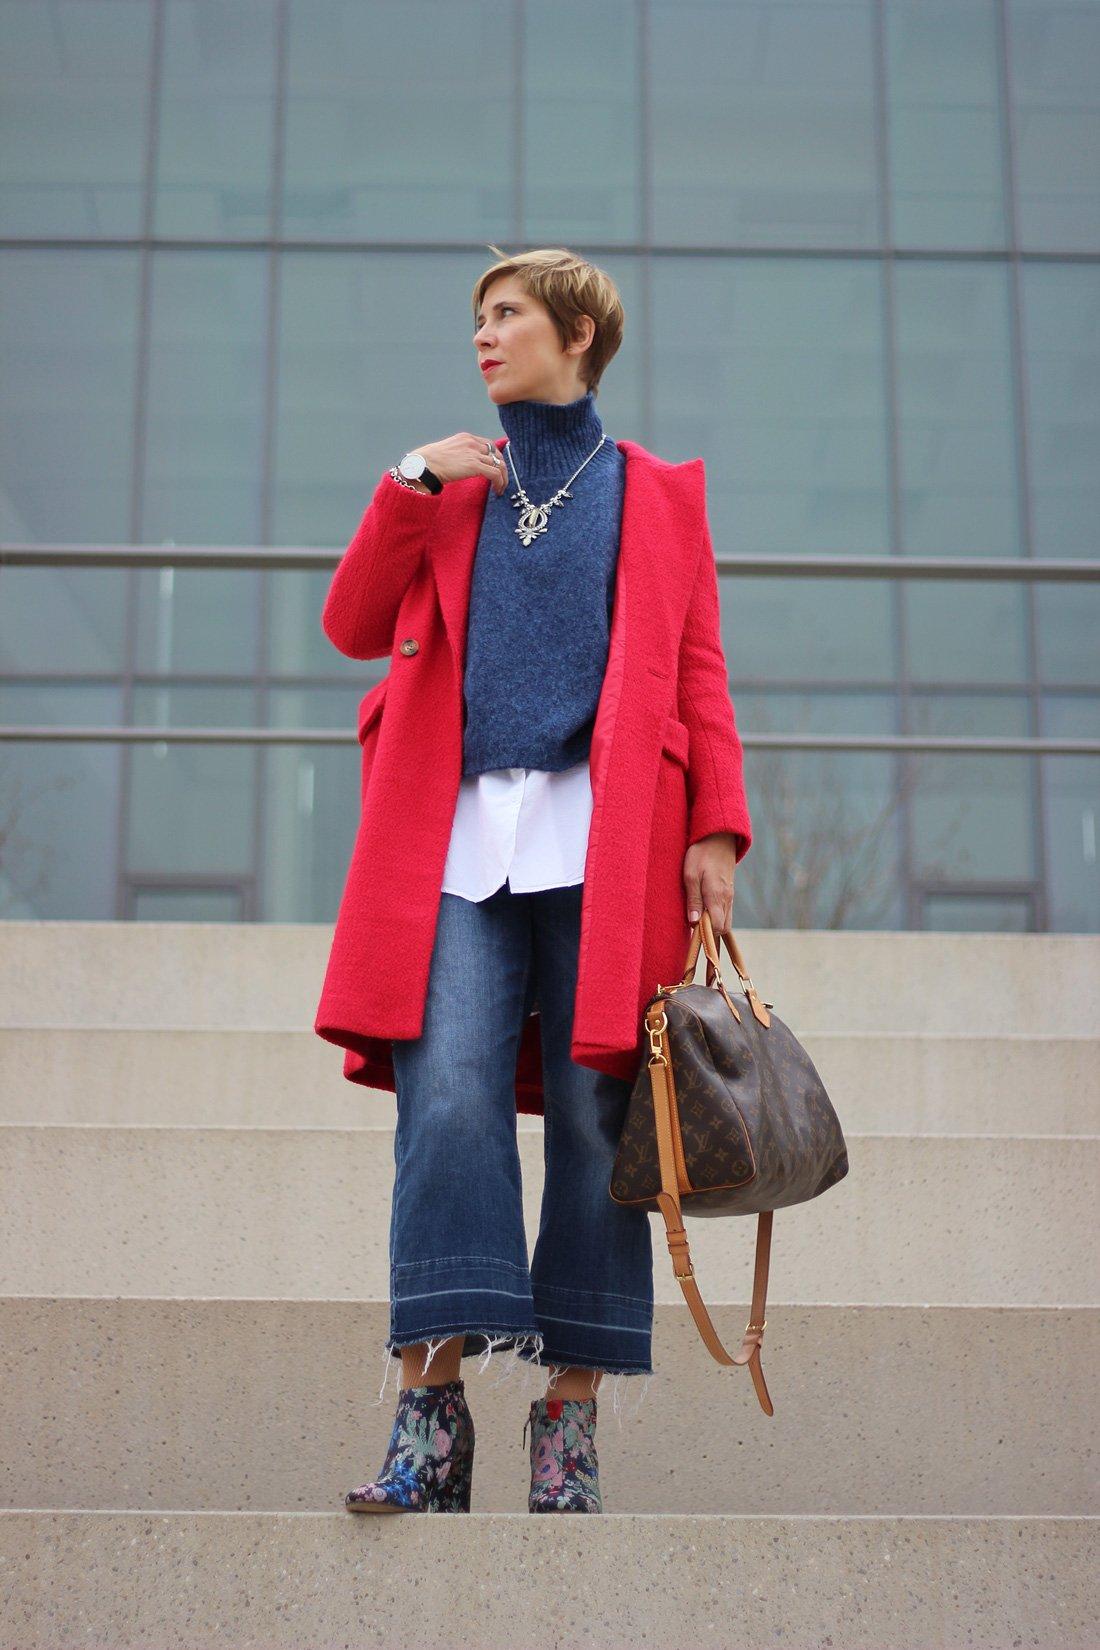 Oversize-Pullover, Cropped Jeans, Stiefeletten, Blockabsatz, bestickt, Blau, roter Mantel, Conny Doll, RicVanMur-Armband